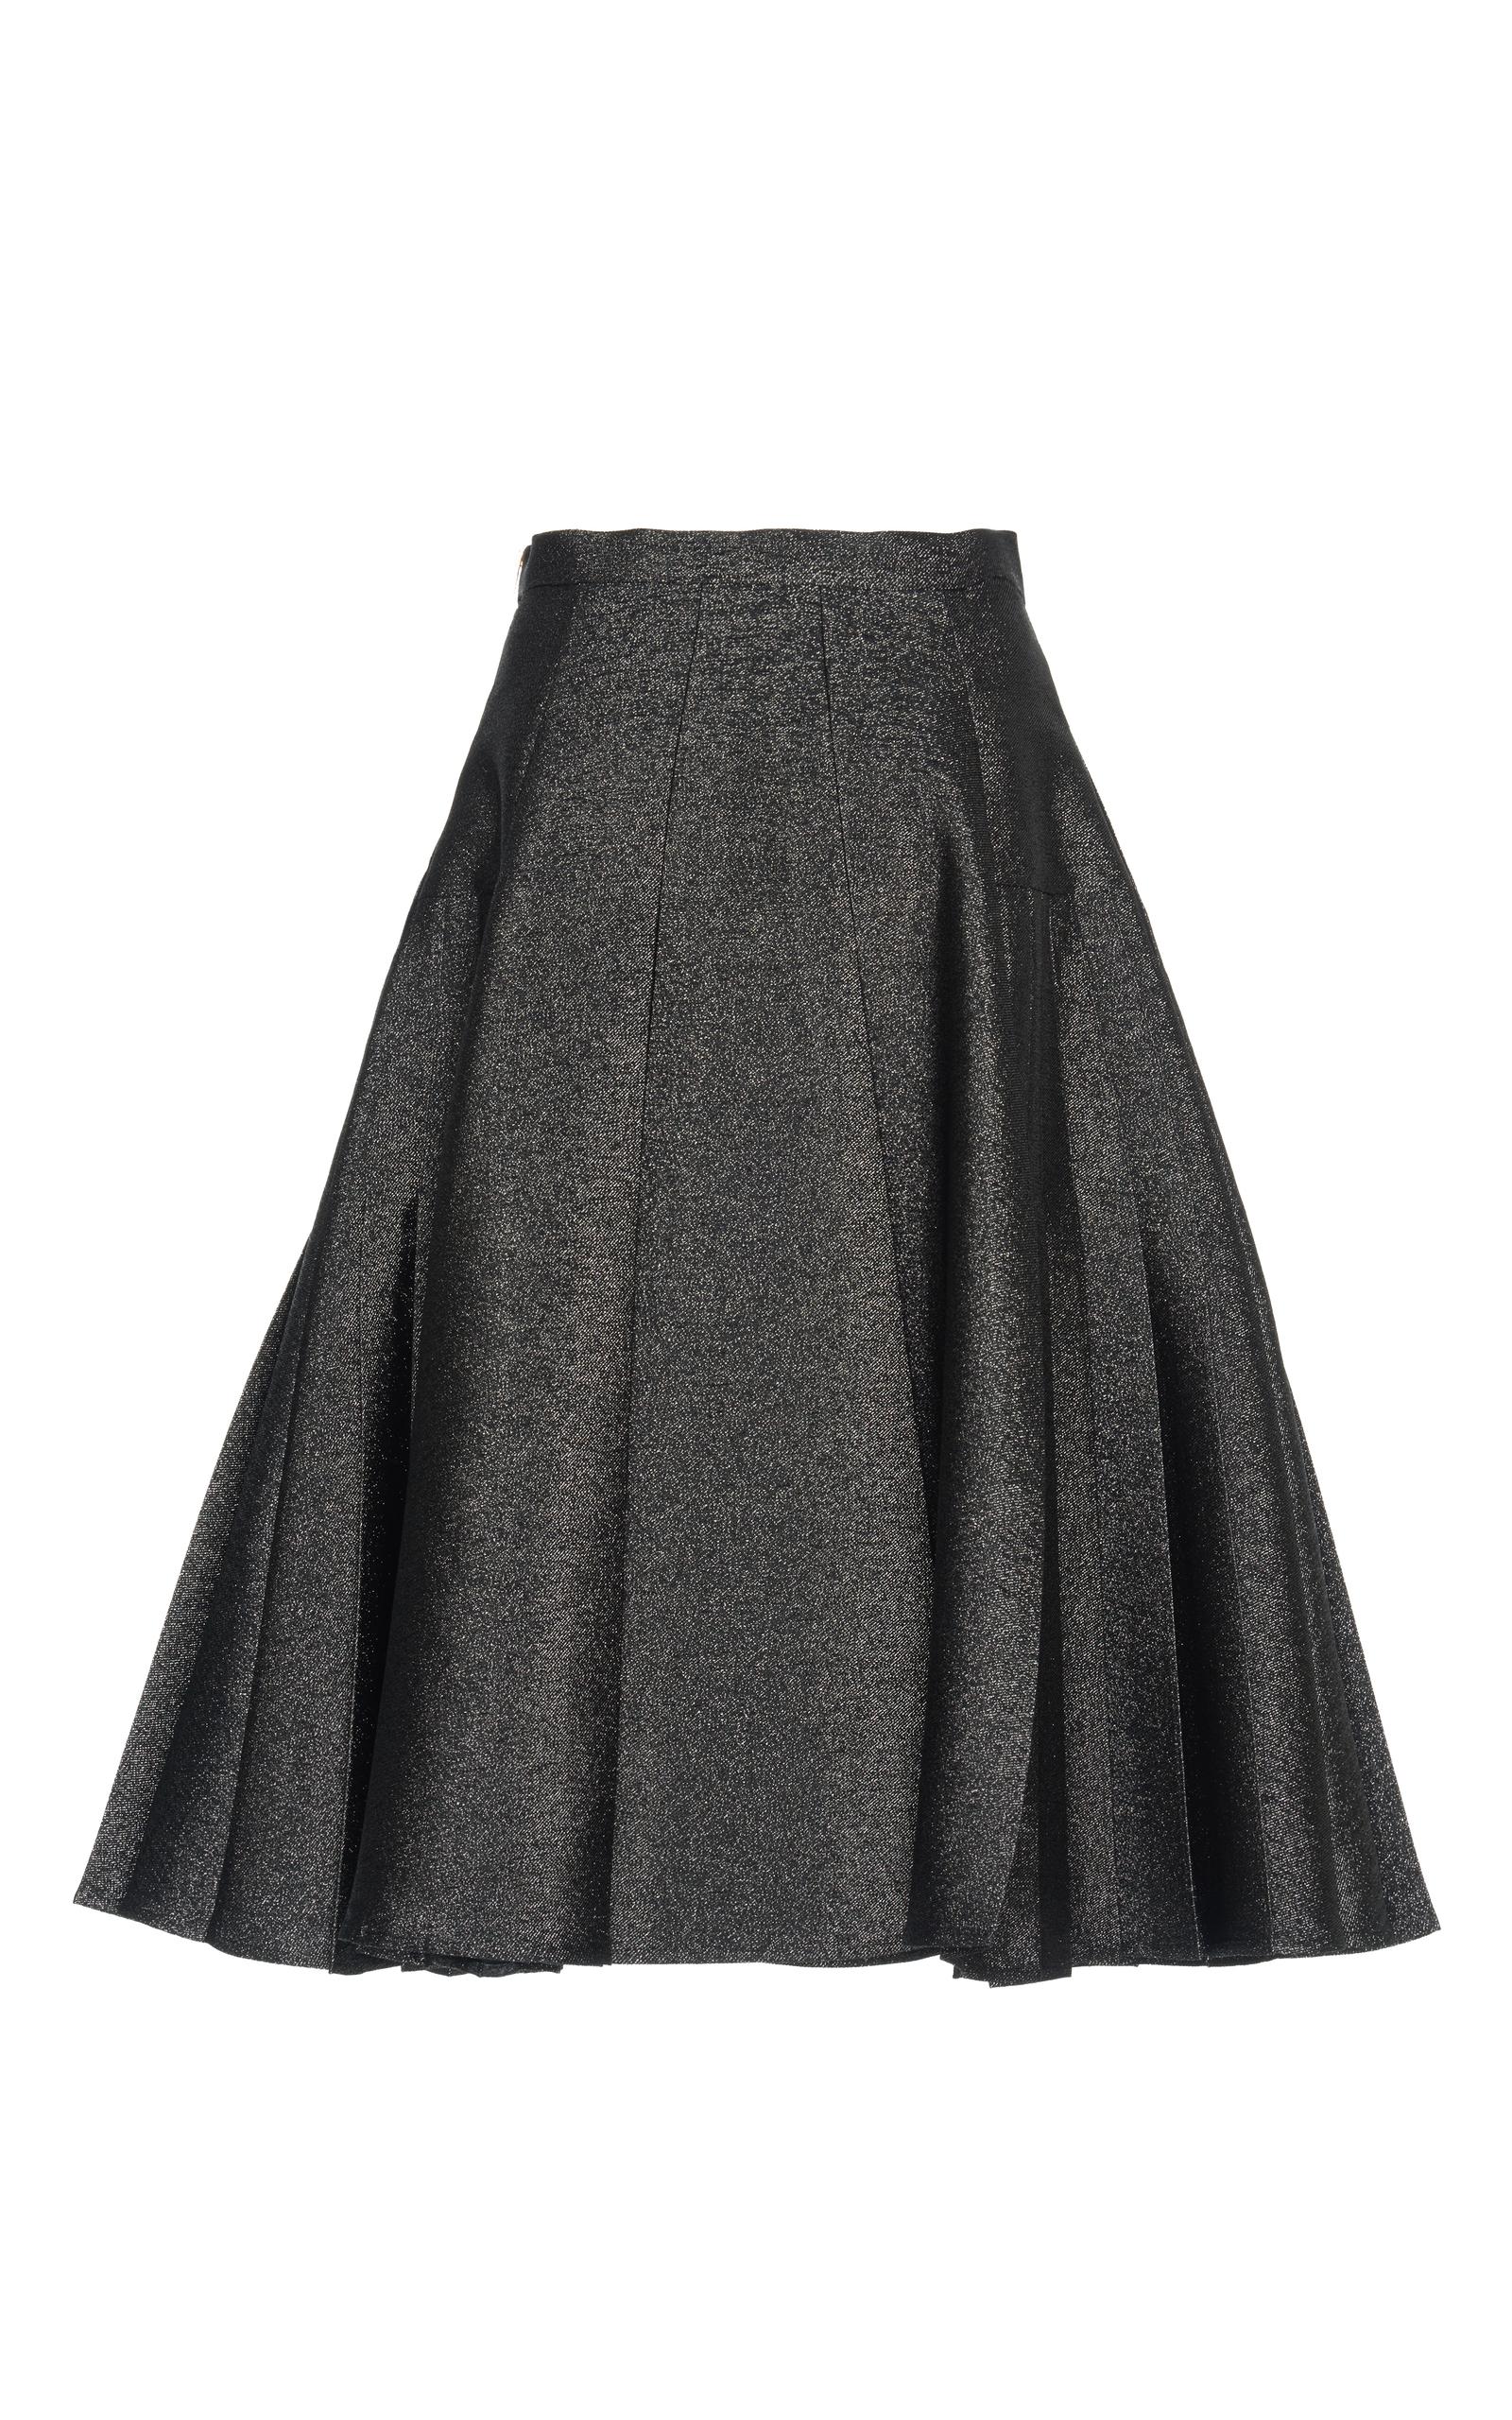 A-line Pleated Skirt by Rossella Jardini | Moda Operandi